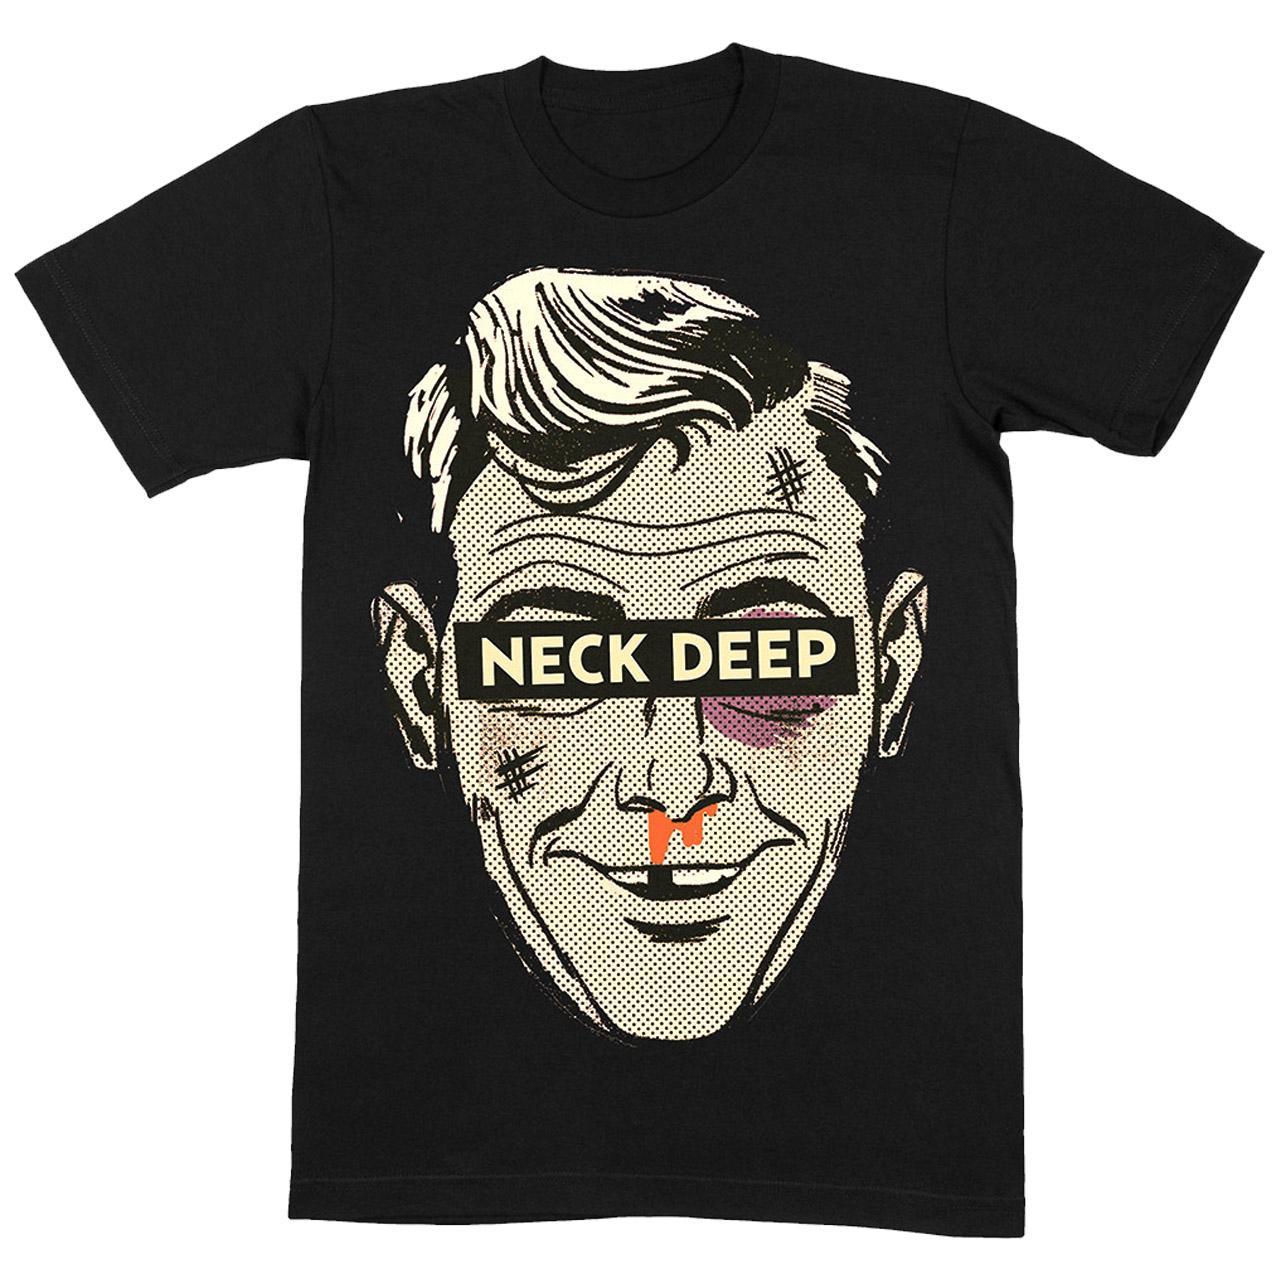 NECK DEEP Ned Tshirt